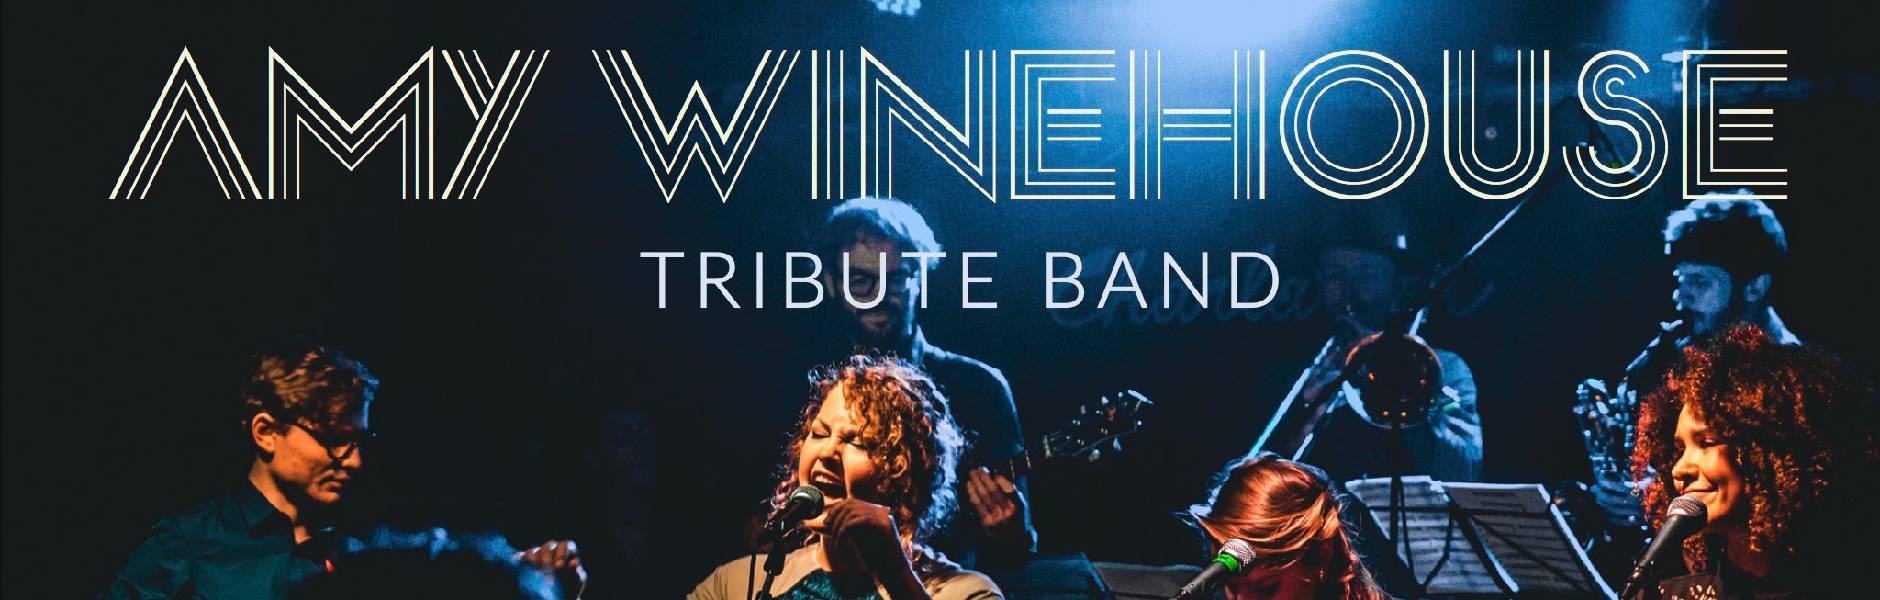 Amy Winehouse tribute band